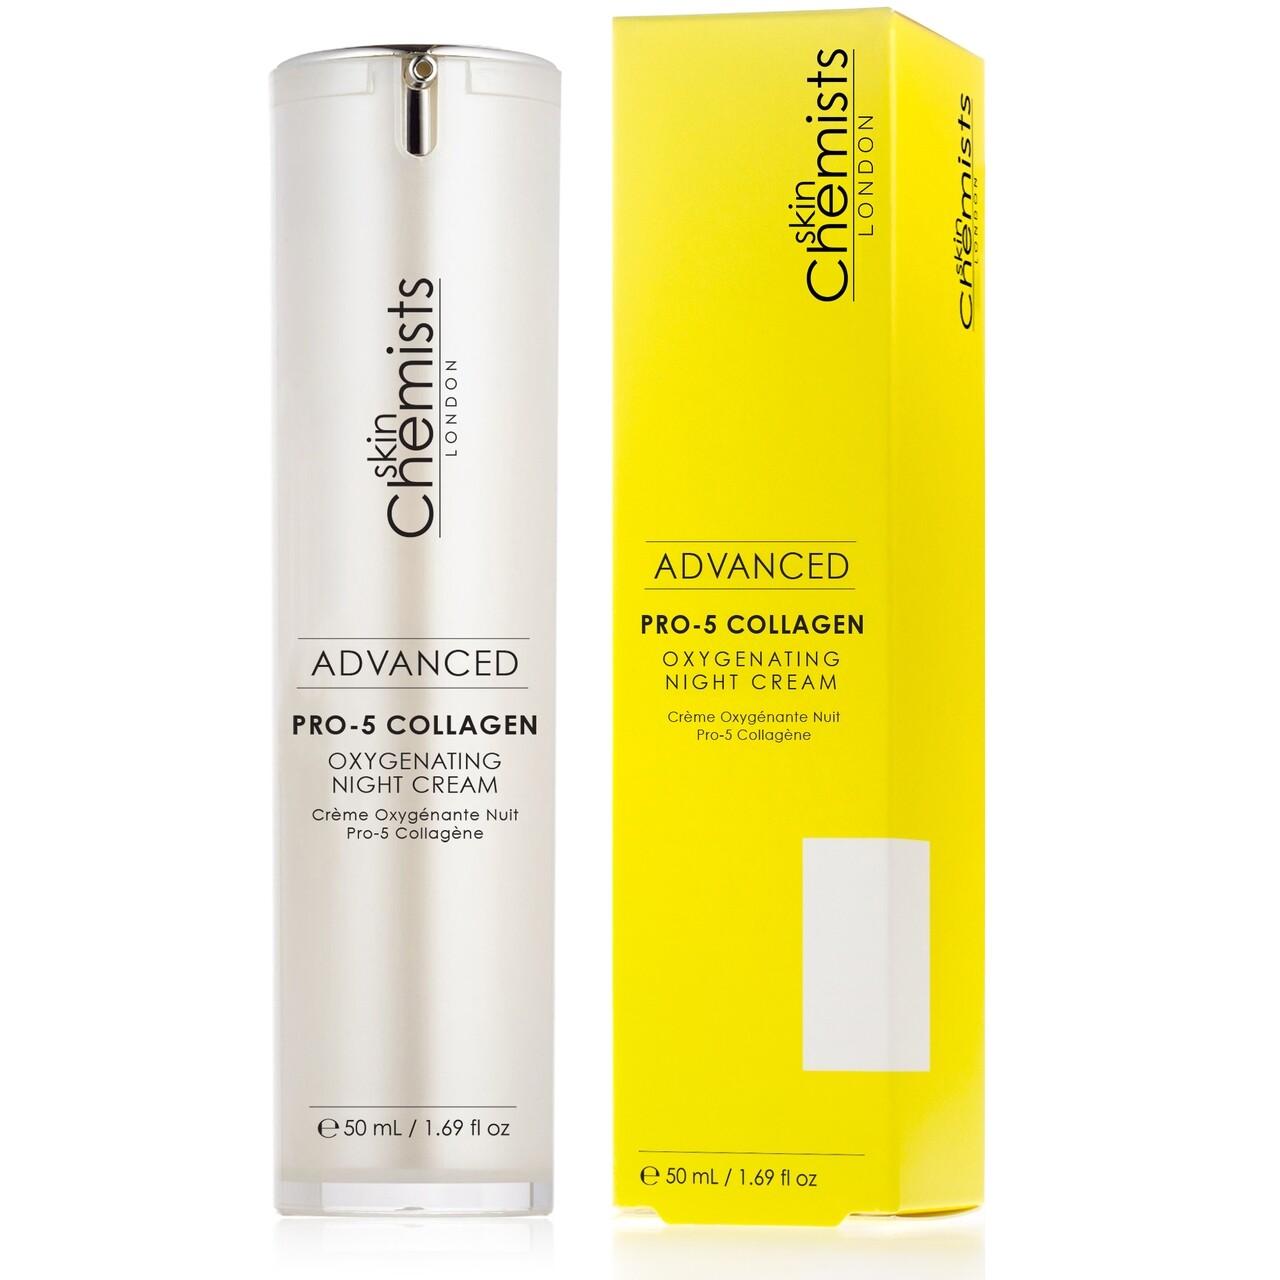 Crema de noapte cu colagen Pro-5, SkinChemists, Advanced Oxygenating Night Cream, 50 ml